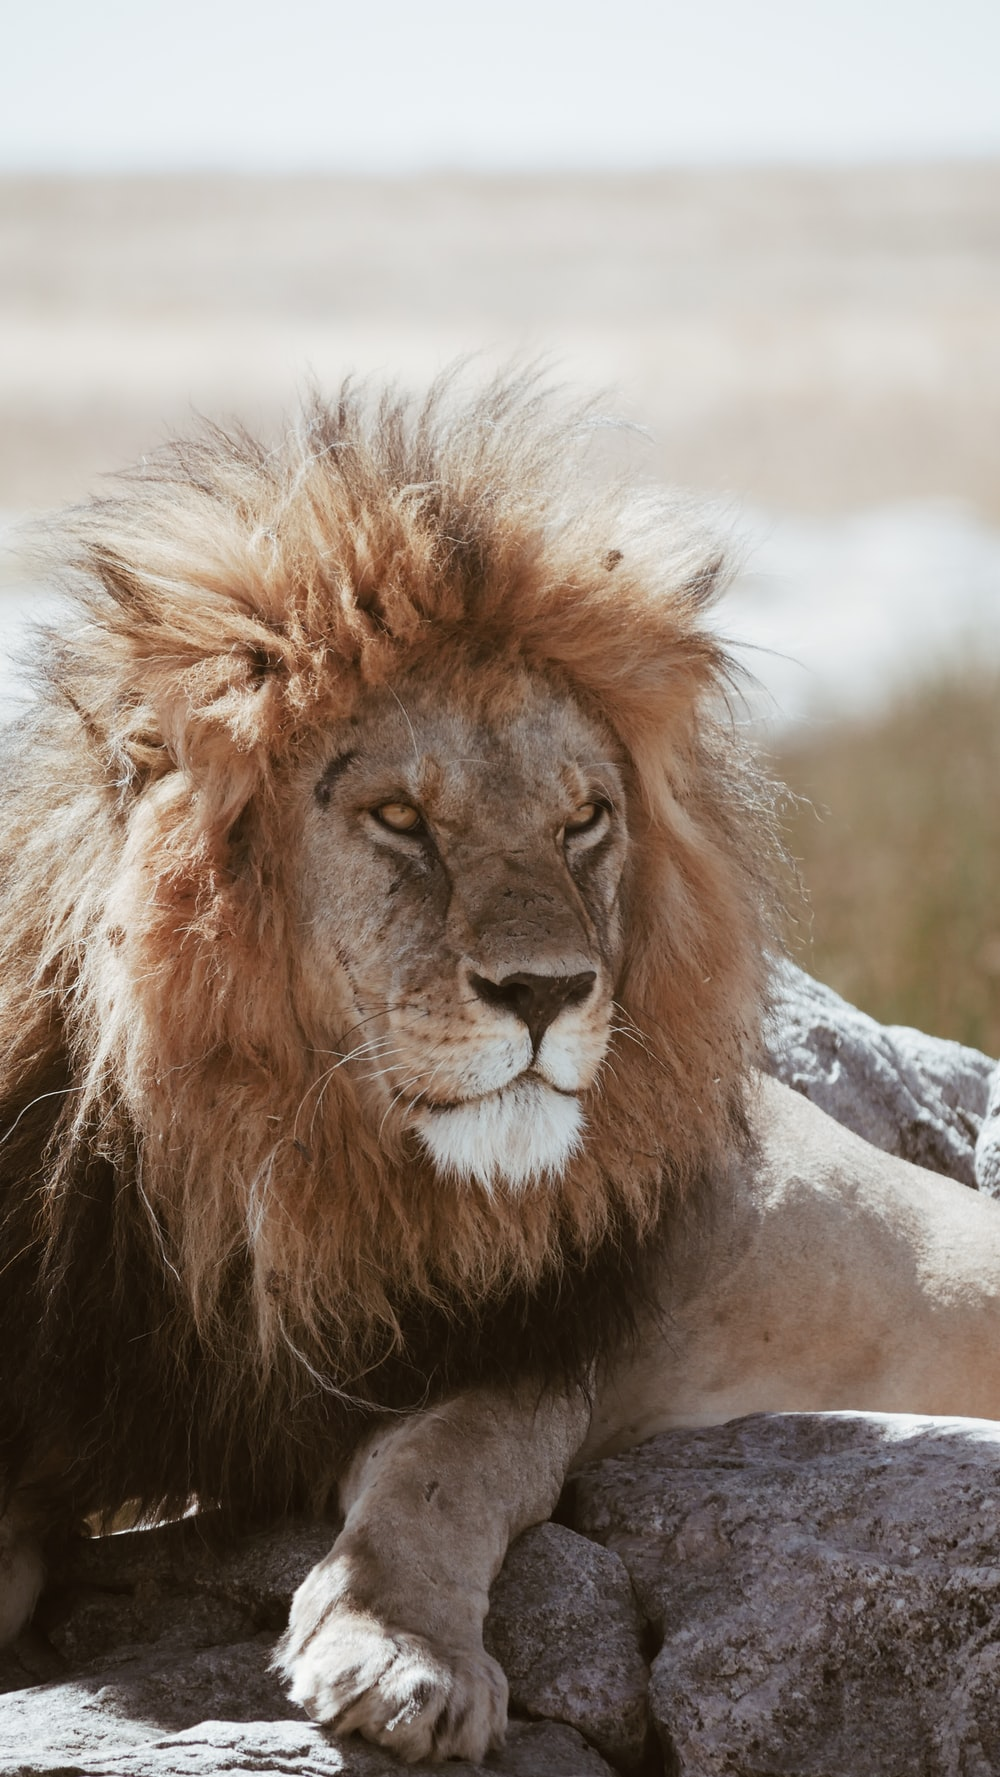 adult brown lion lying on gray rocks